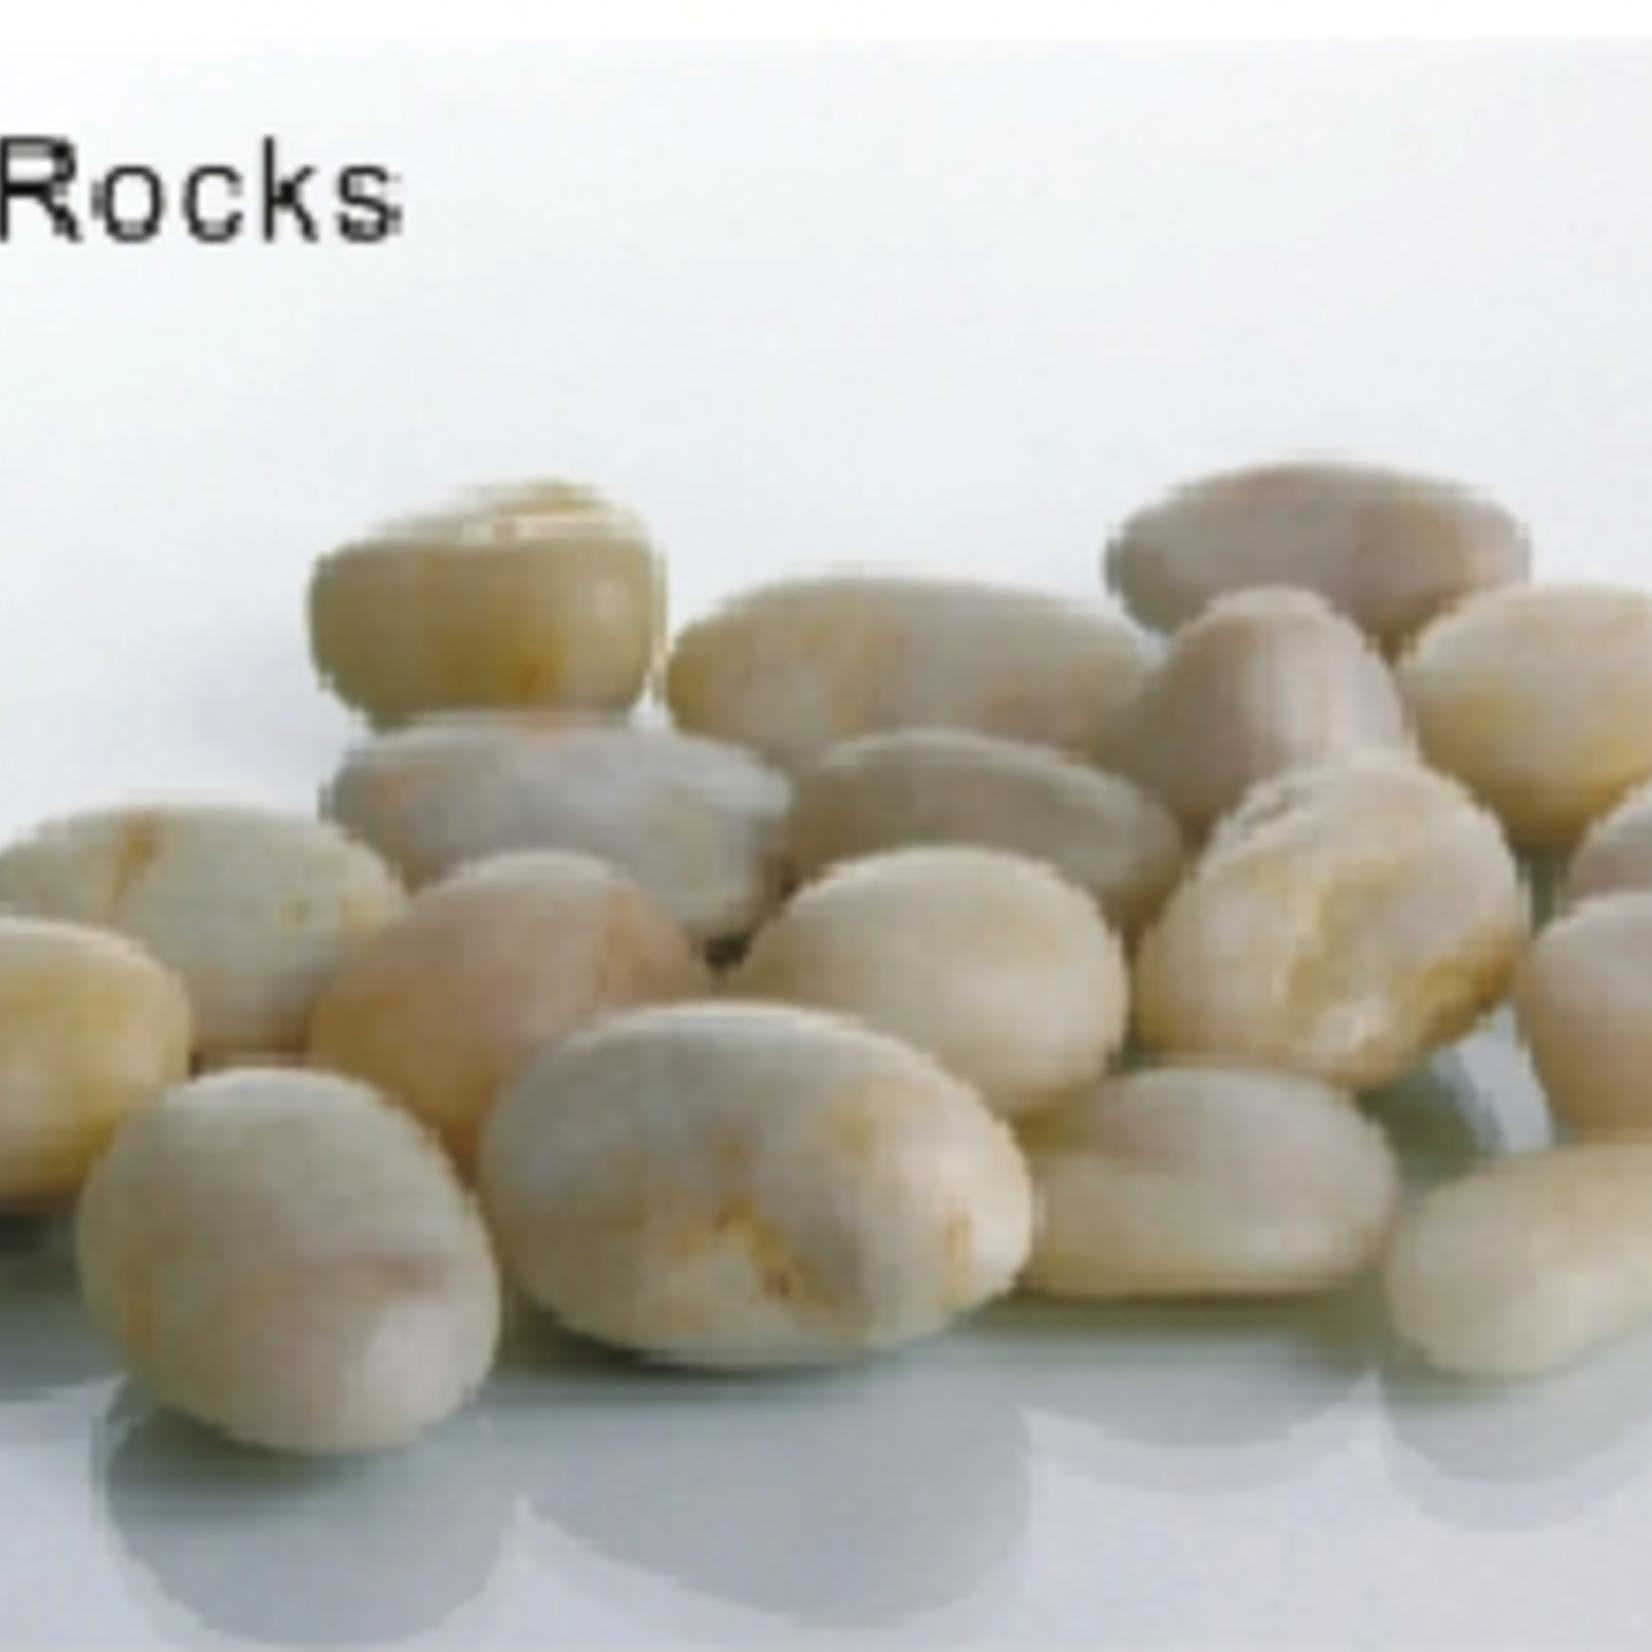 0.8-1CM, WHITE River Rocks PEBBLES  (10lbs/bag)WHITE, 10 LBS/BAG